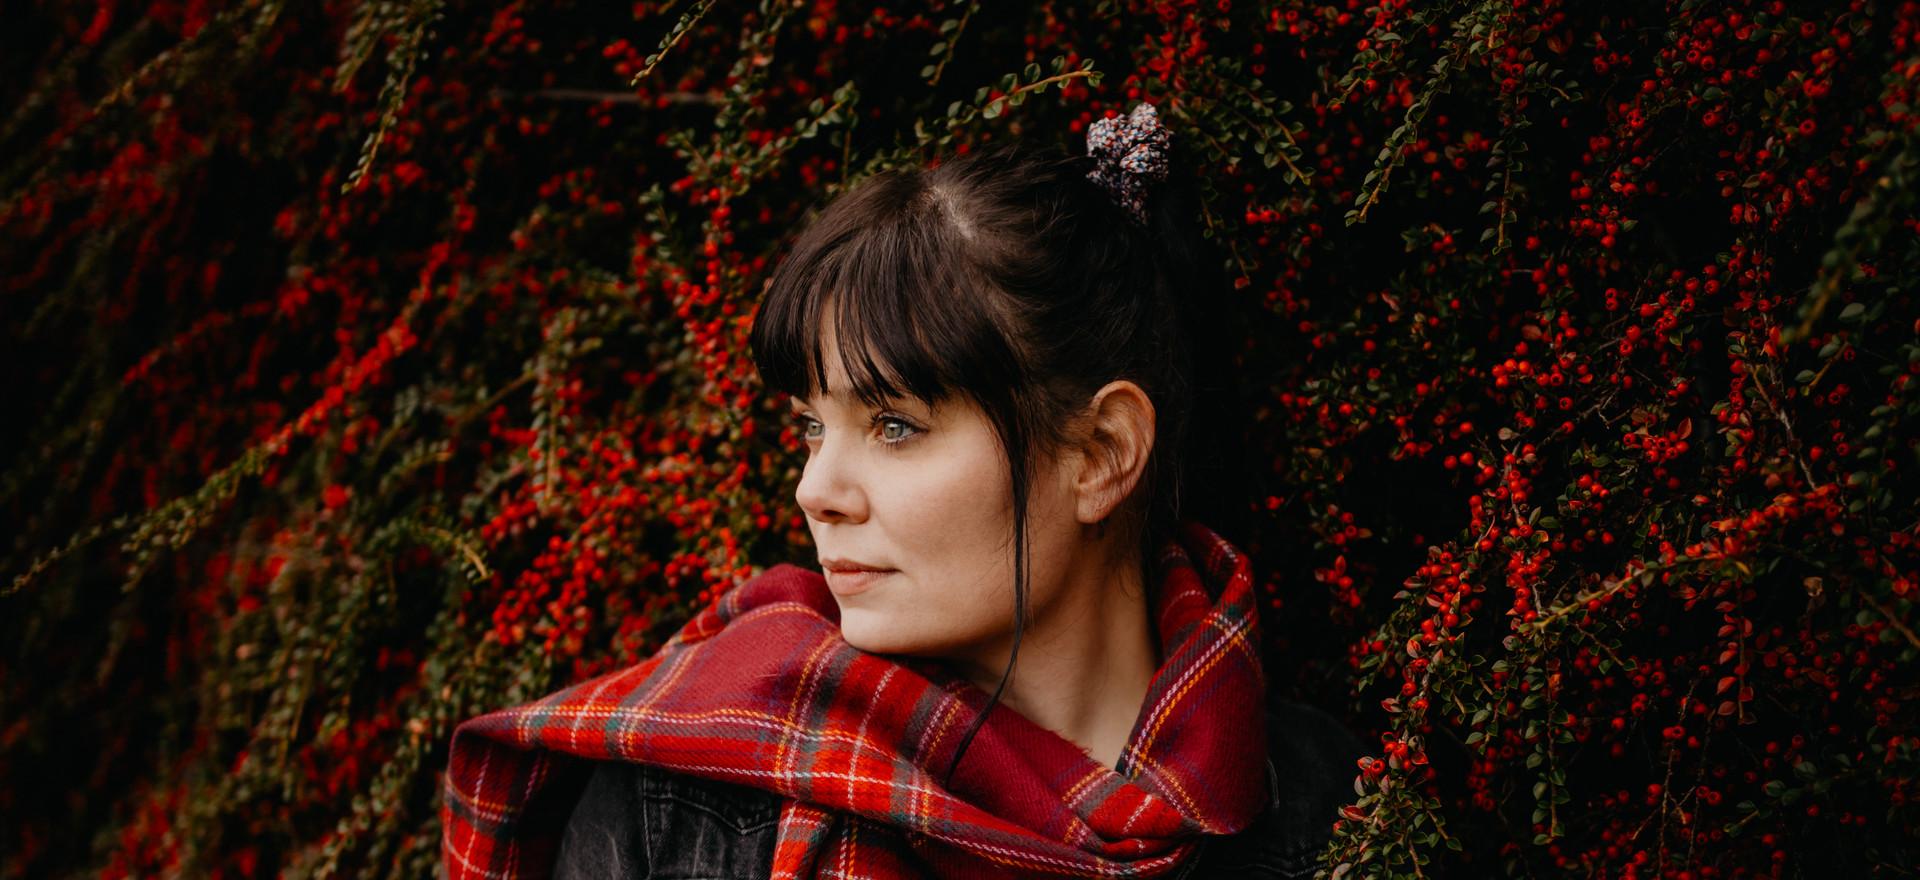 Debbie McGregor